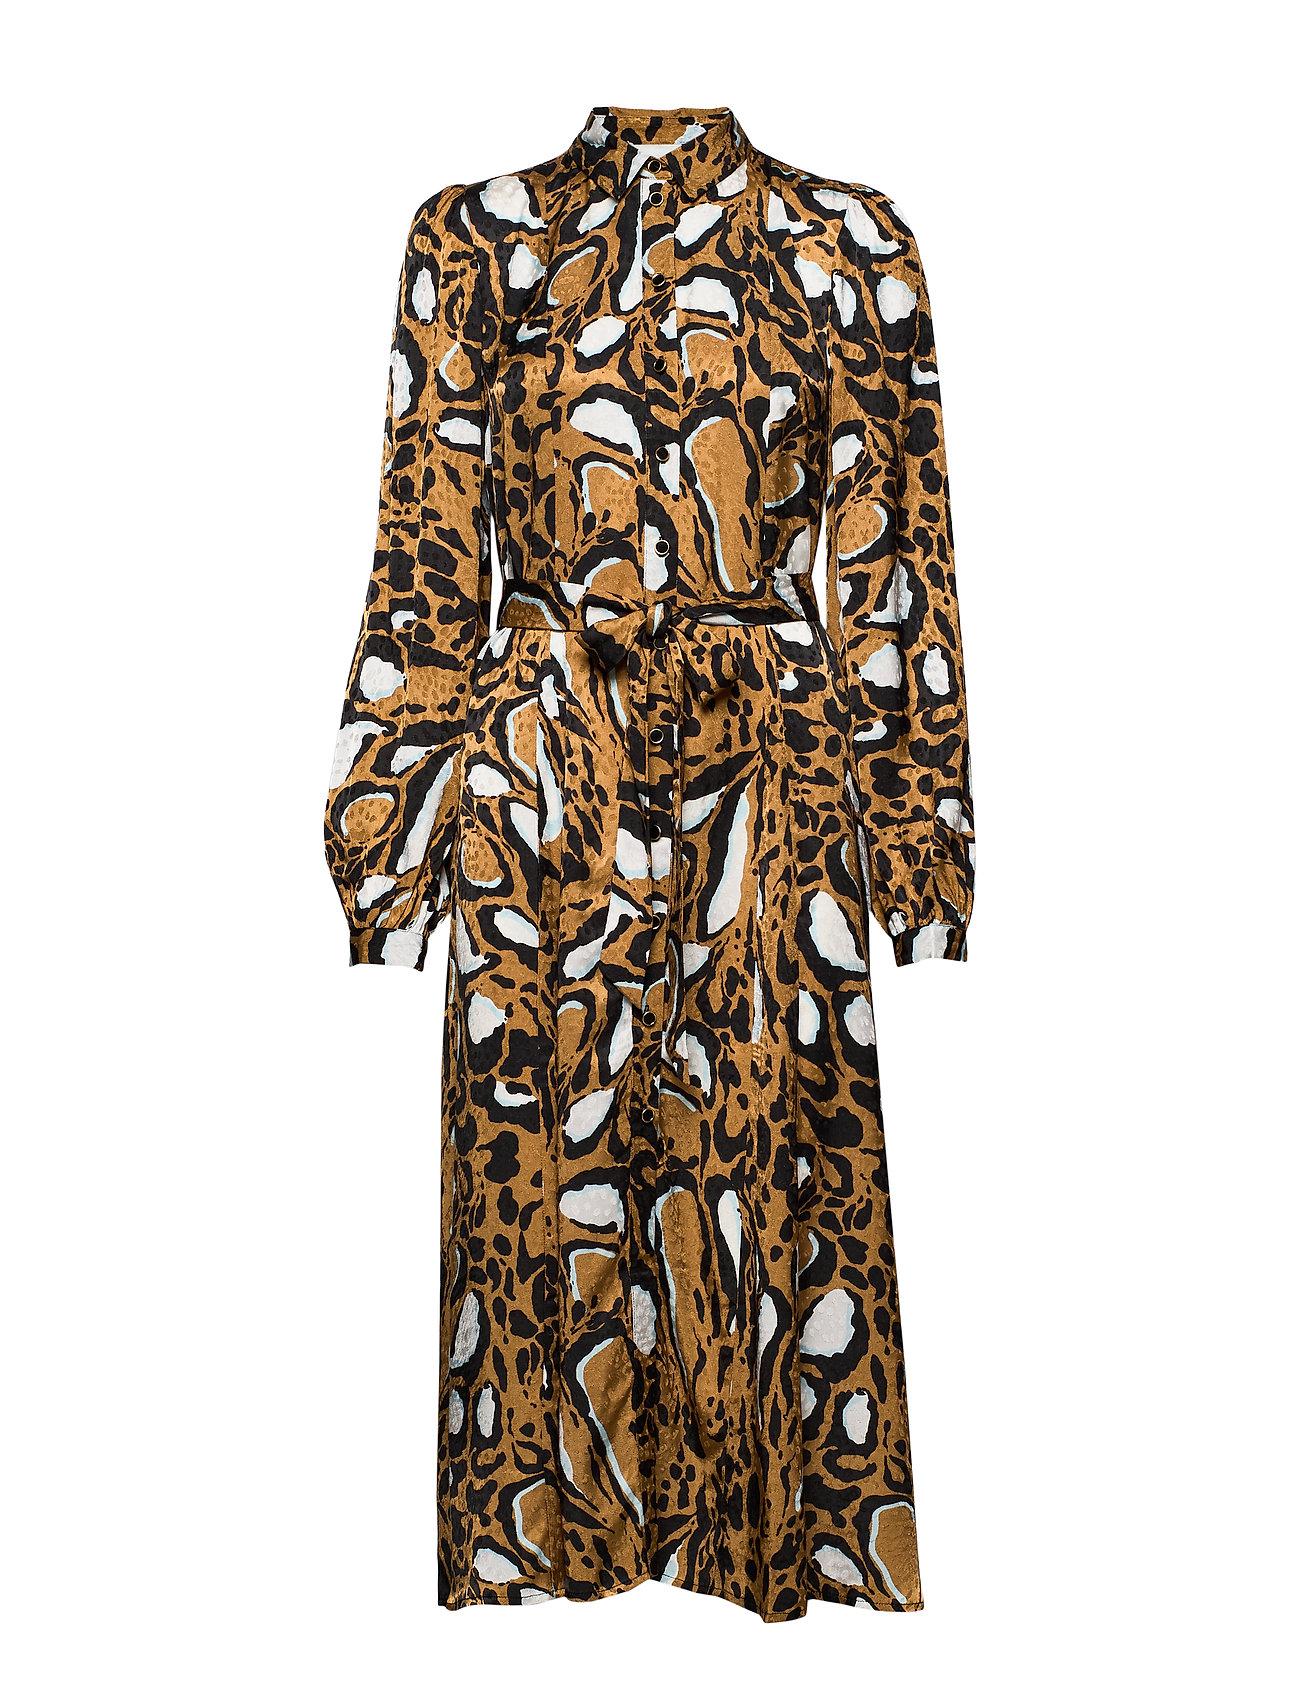 Gestuz LoriGZ dress SO20 - BROWN LEO